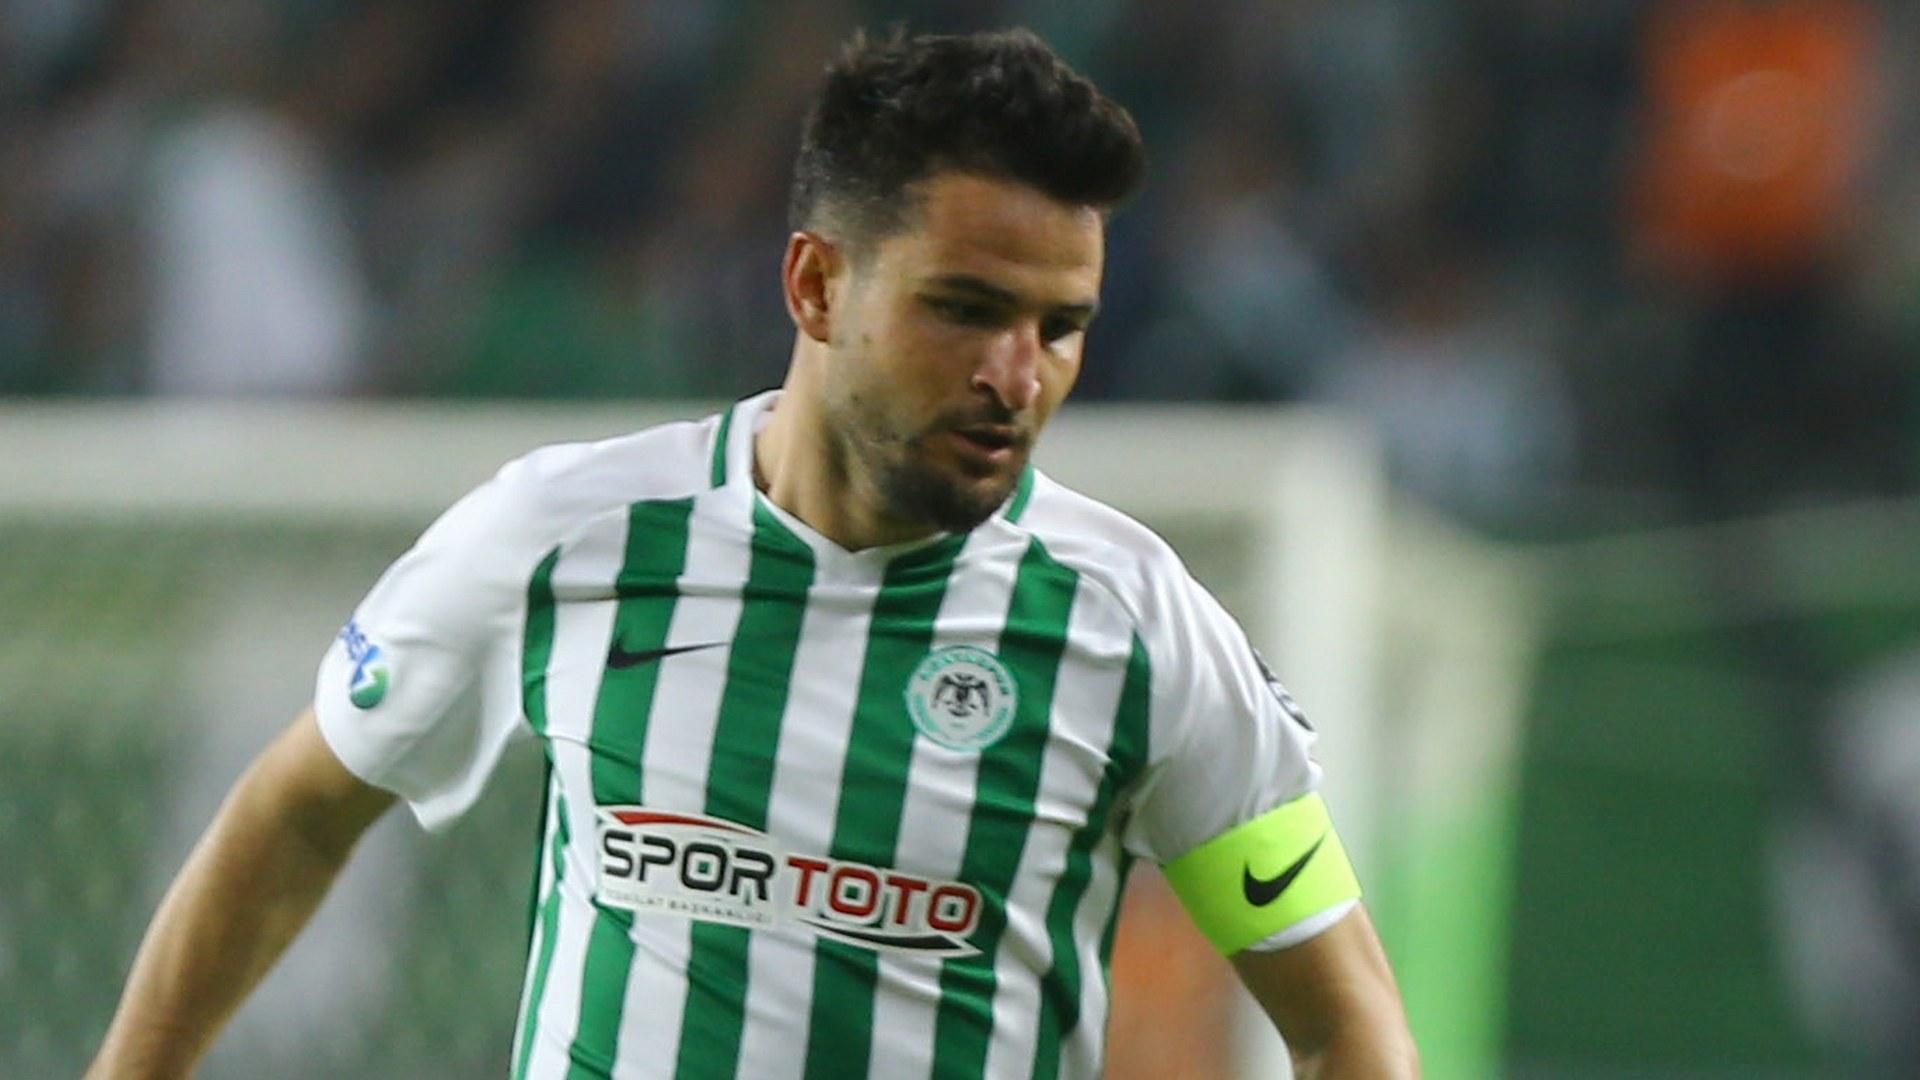 Omer Ali Sahiner Konyaspor